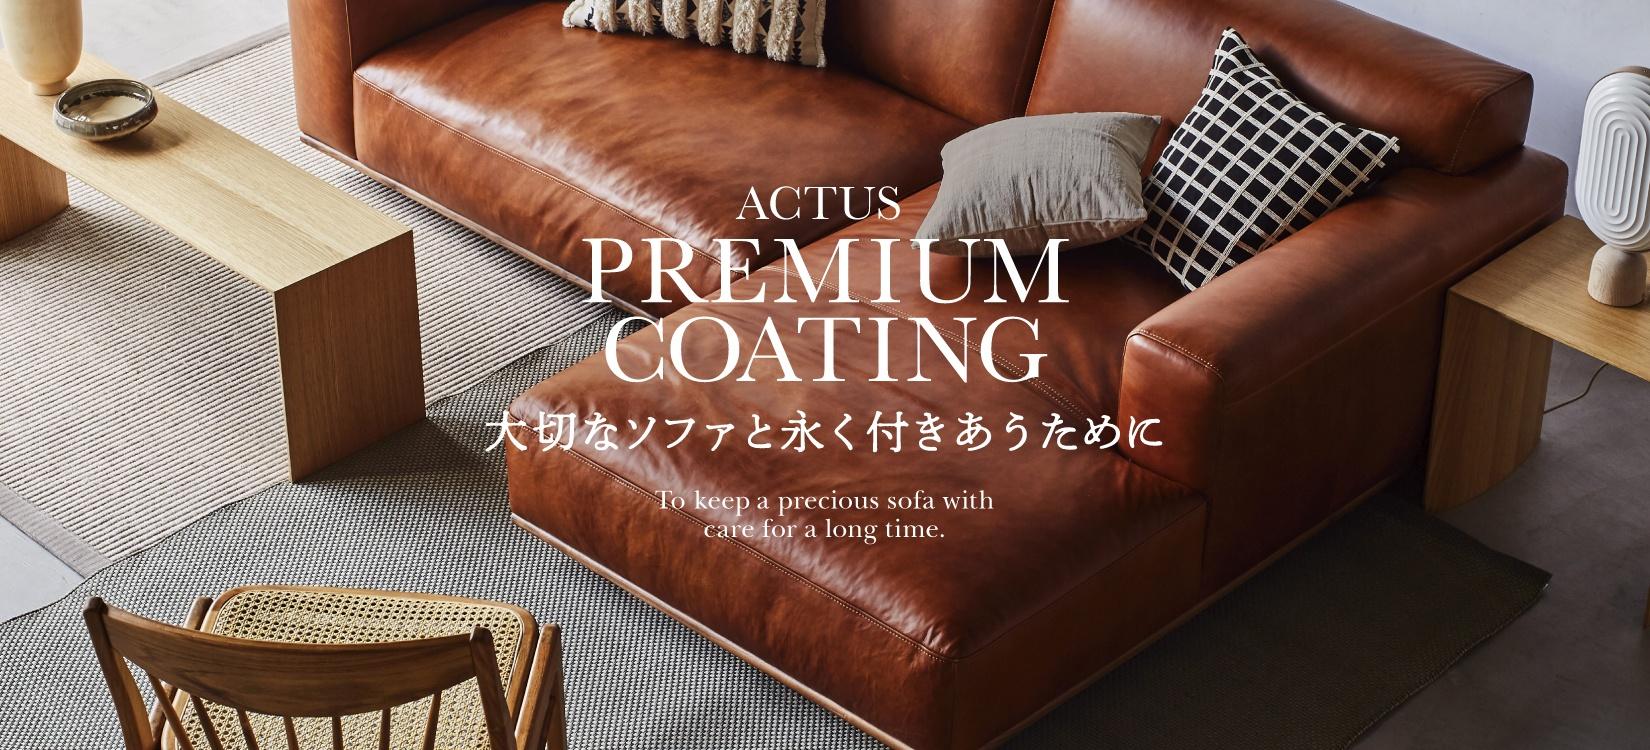 INTERIOR GUARD / 大切なソファーと永く付き合うために